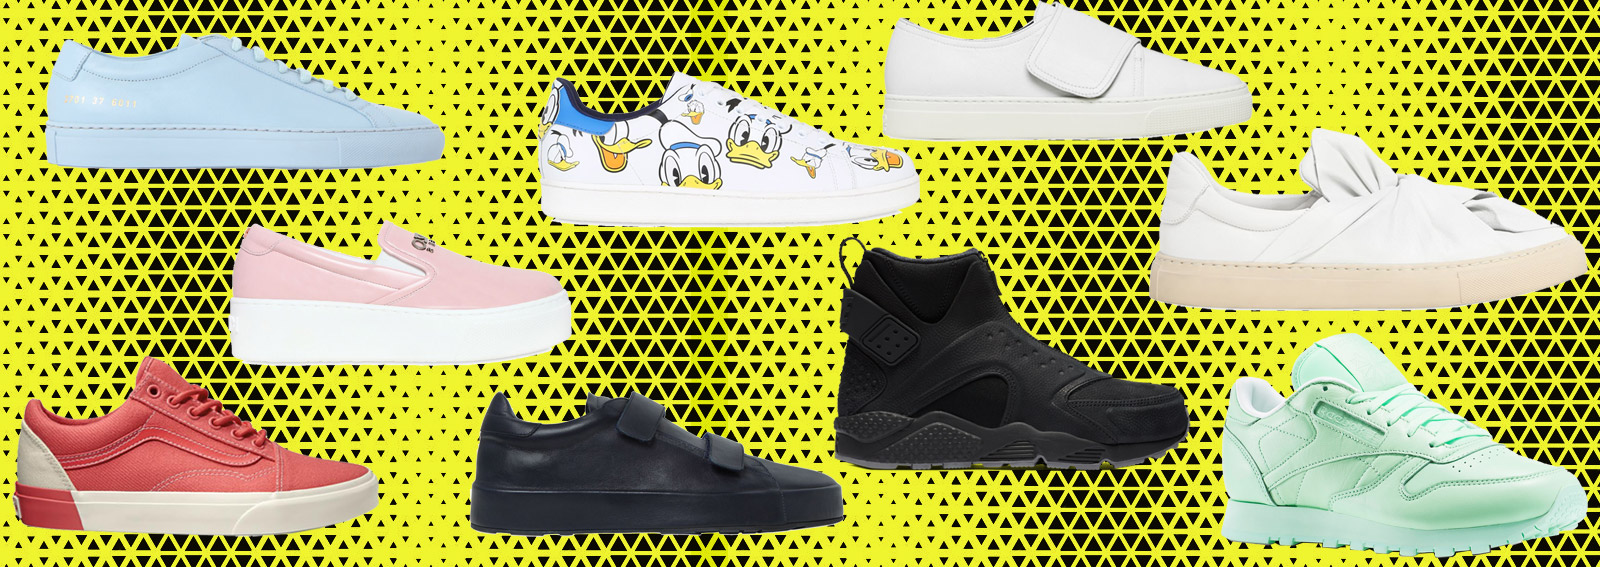 DESKTOP_sneakers2017